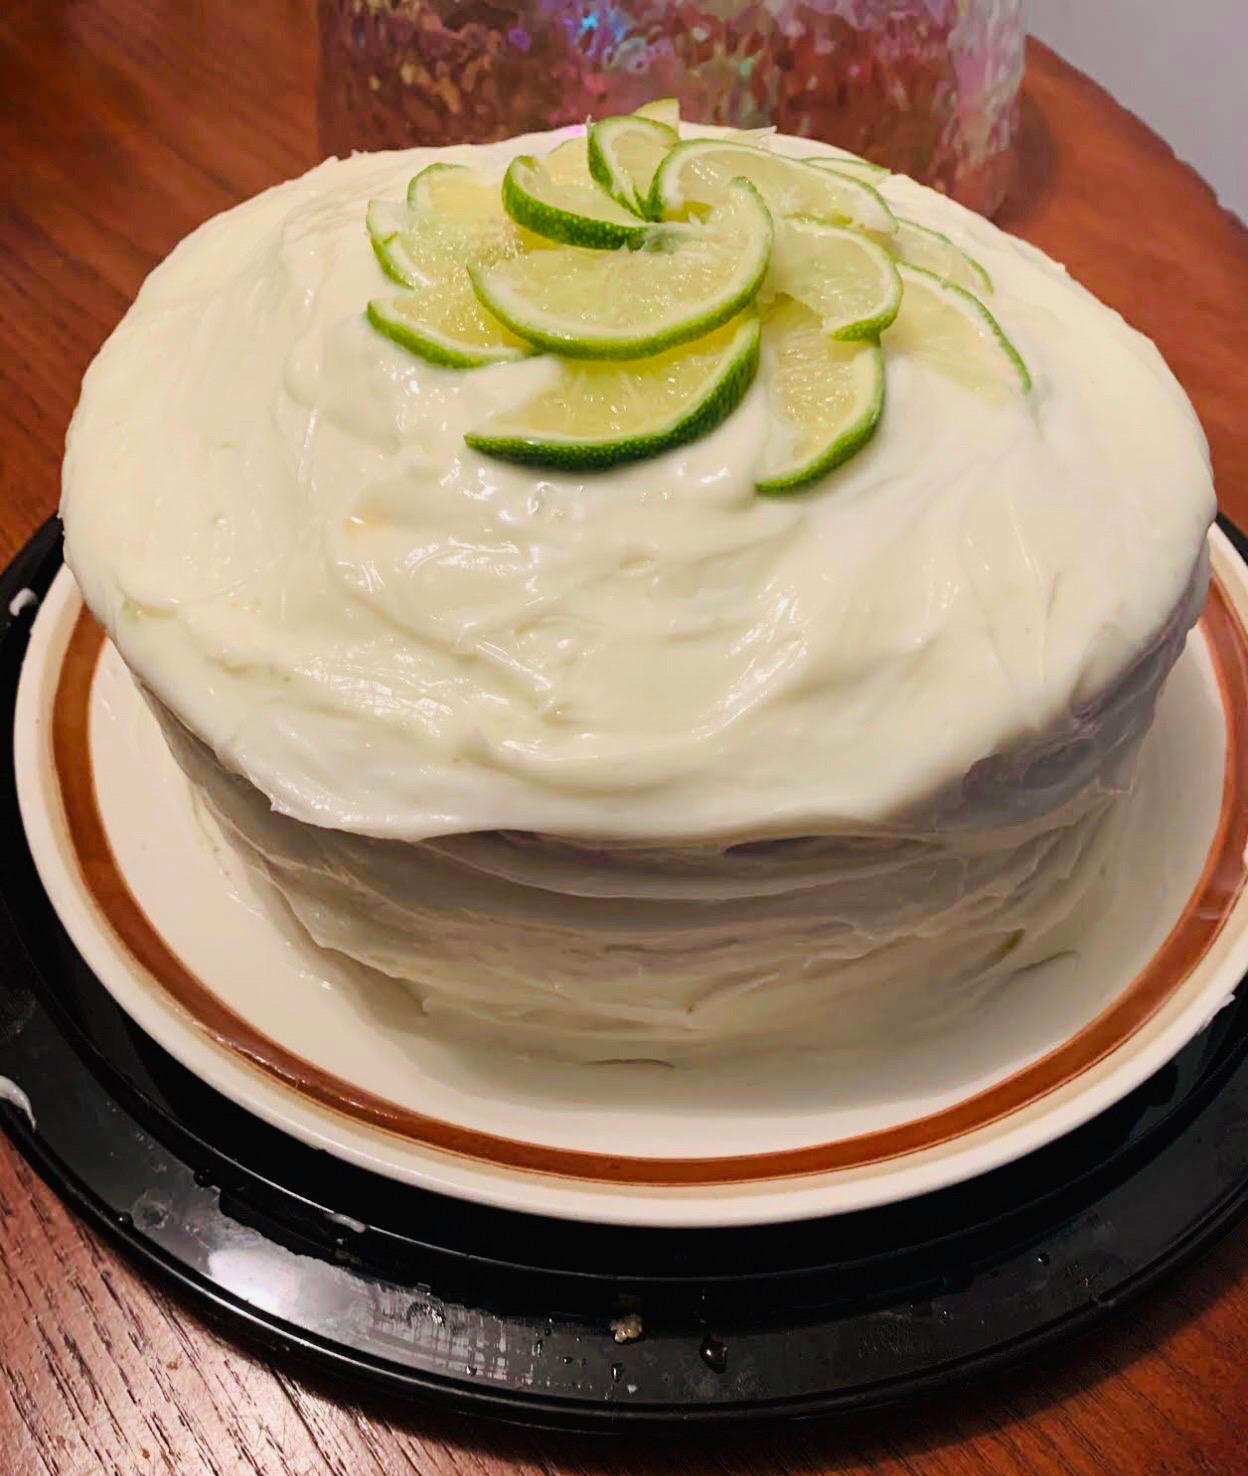 Cake by Ollis Wright